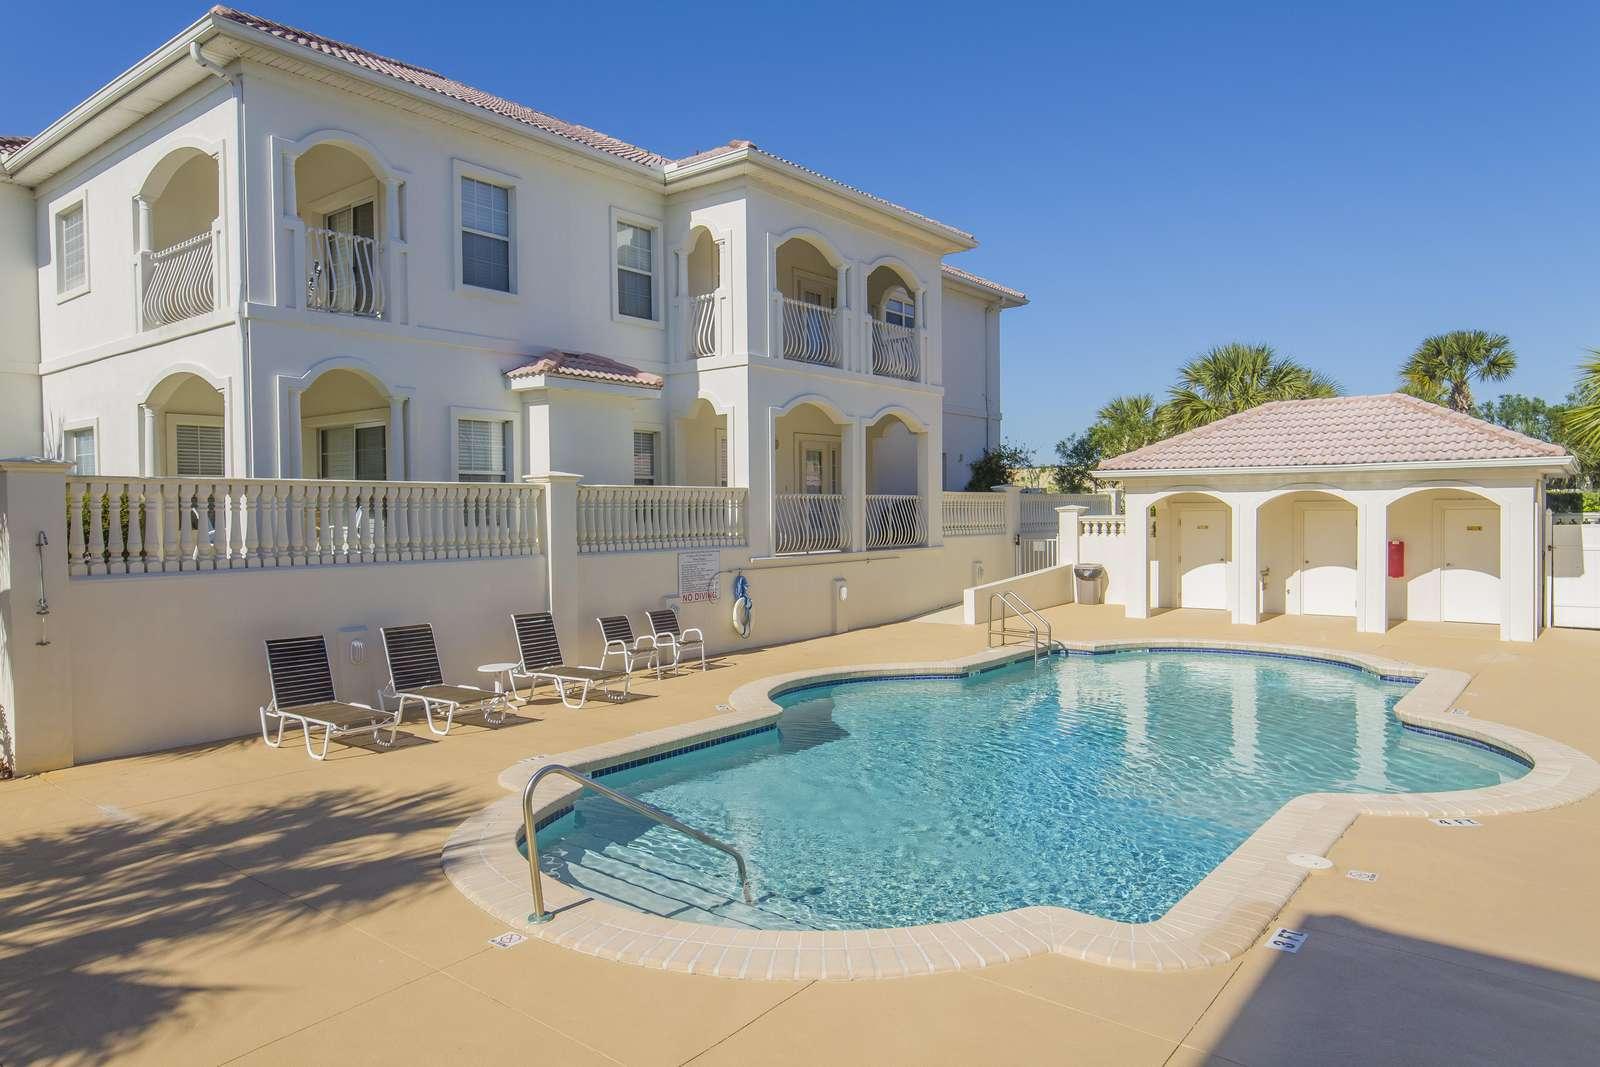 Villas of Ocean Gate #341 - property